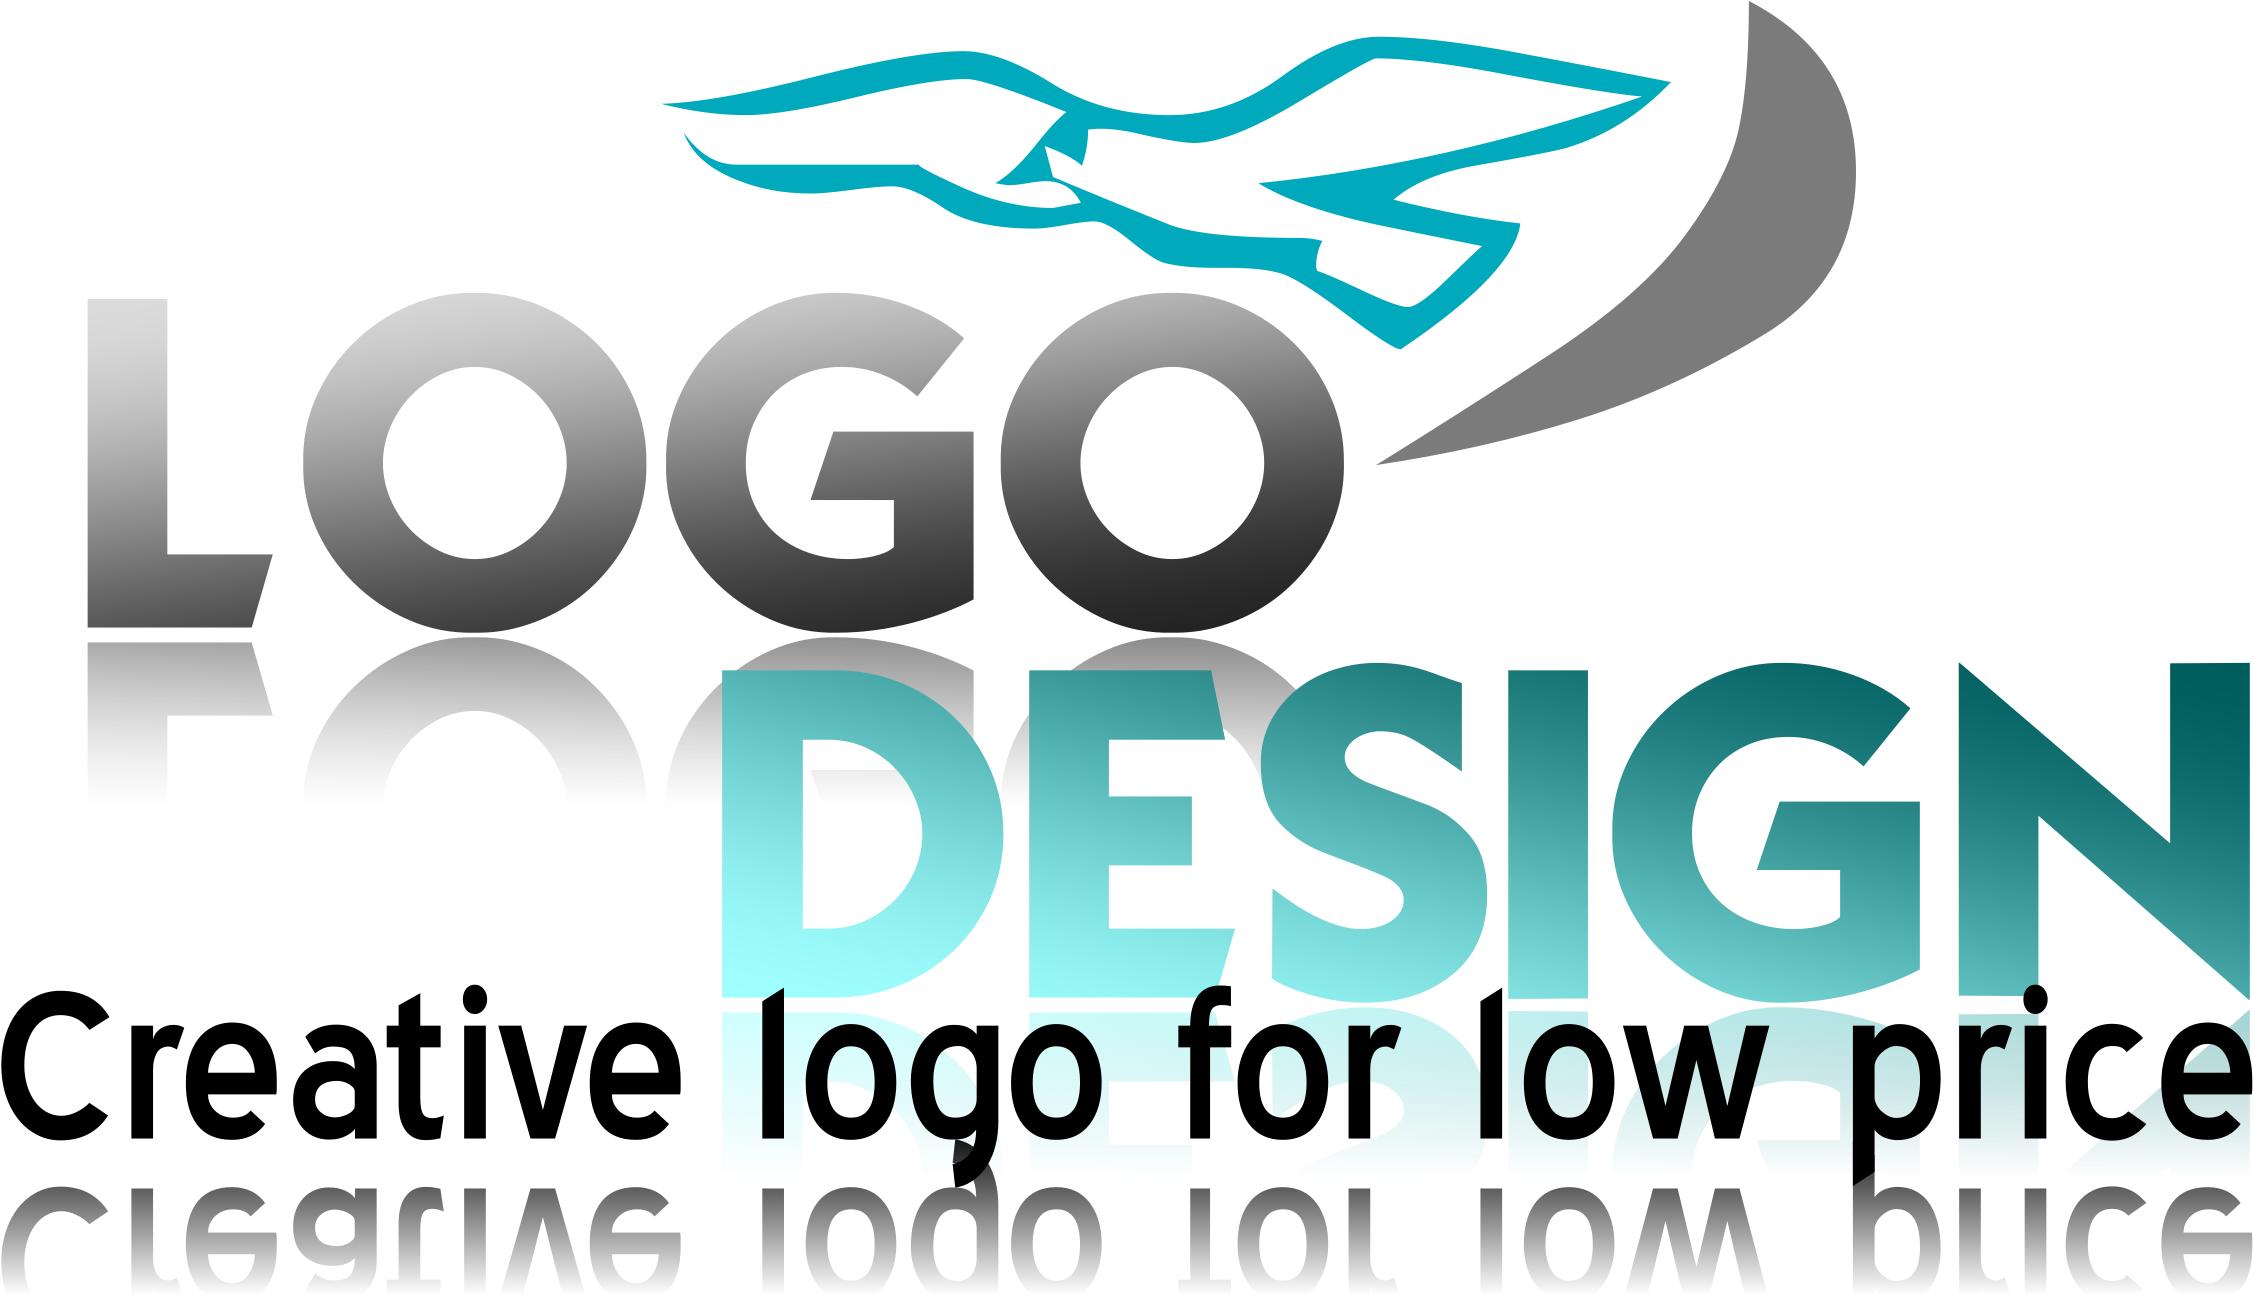 make creative logo for low price